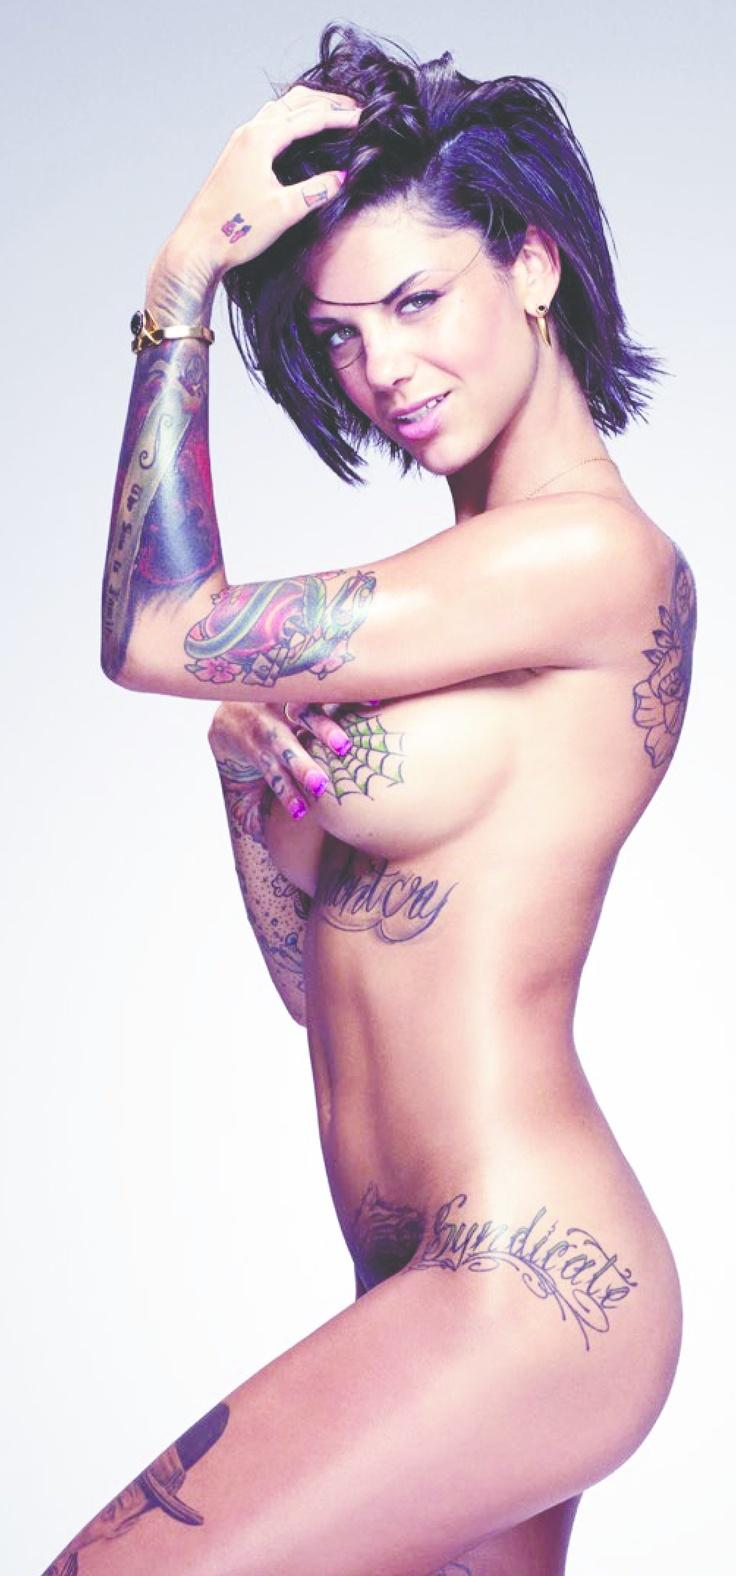 mesar butiful girl nude